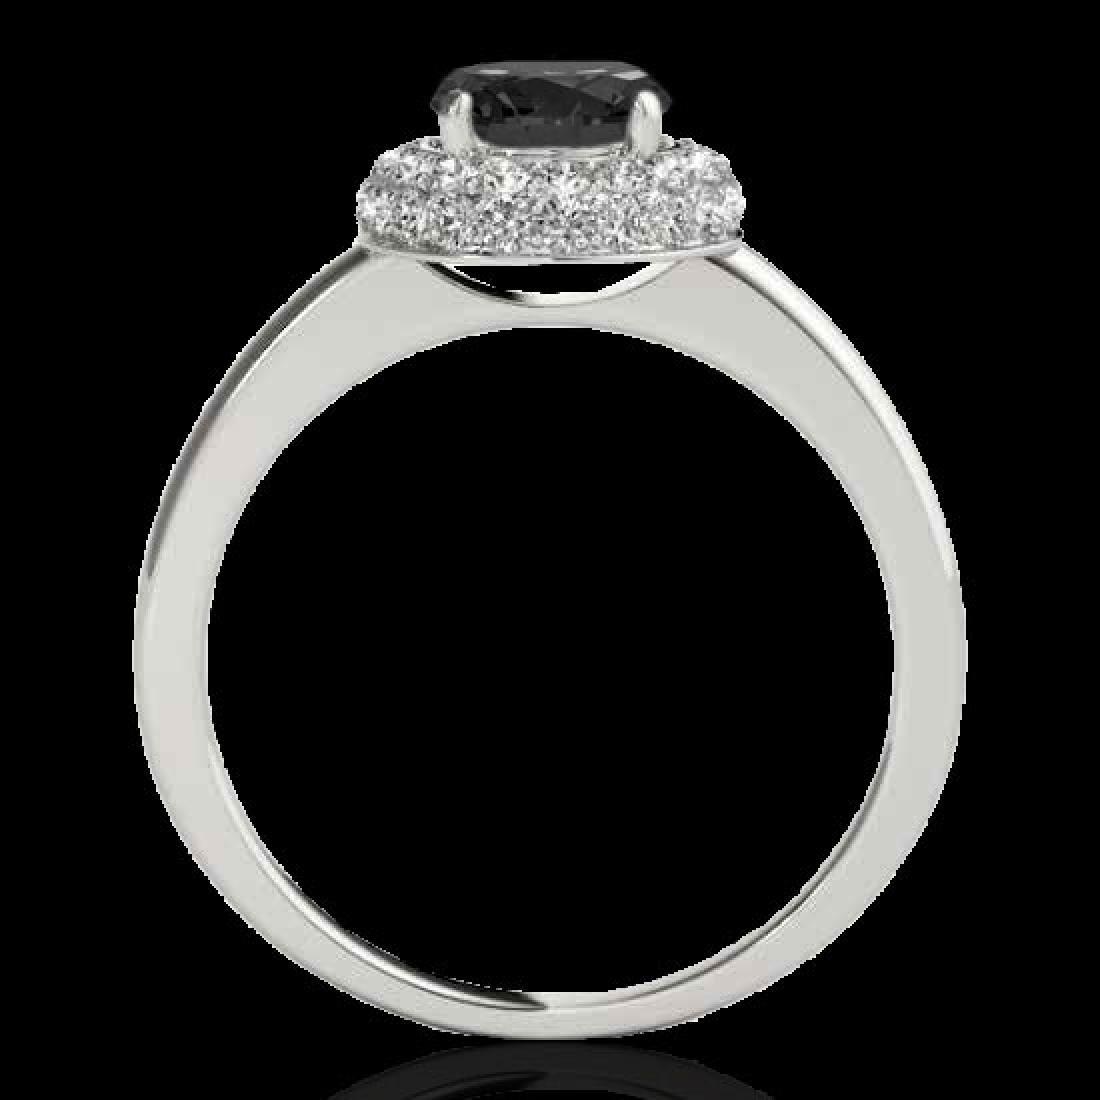 1.43 CTW Certified VS Black Diamond Solitaire Halo Ring - 2